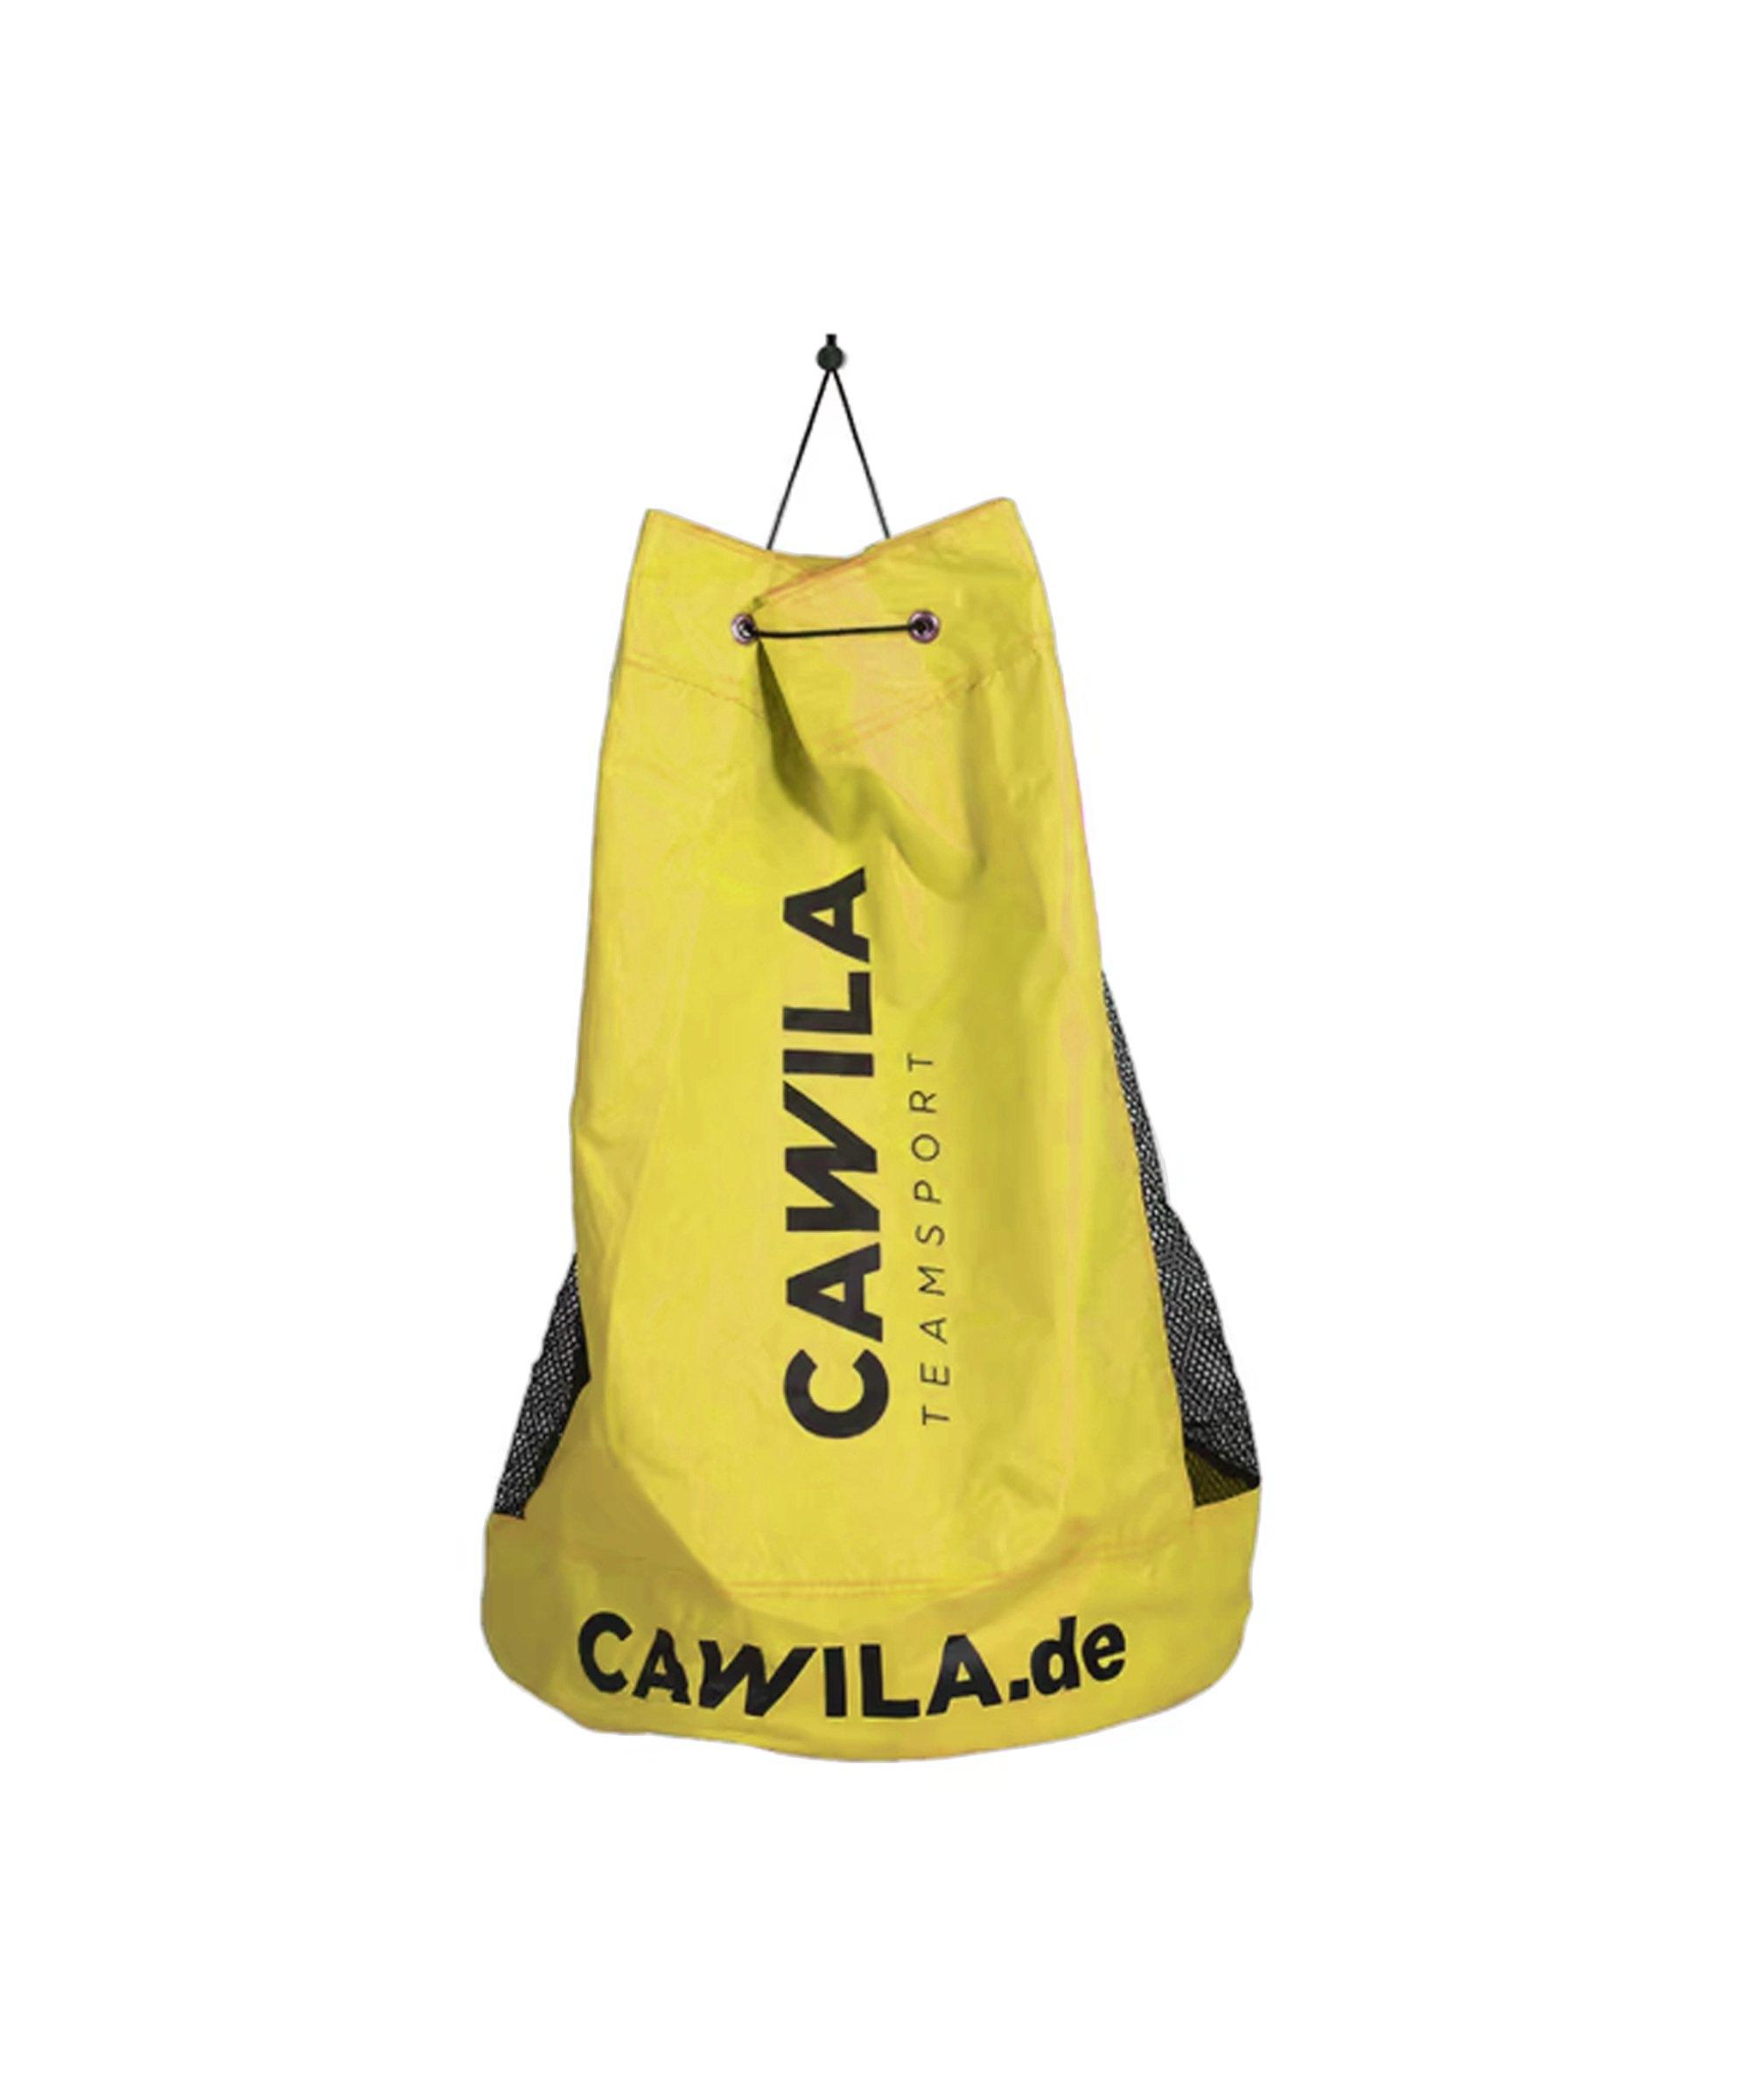 Cawila Ballsack 12 Fussbälle Gelb - gelb